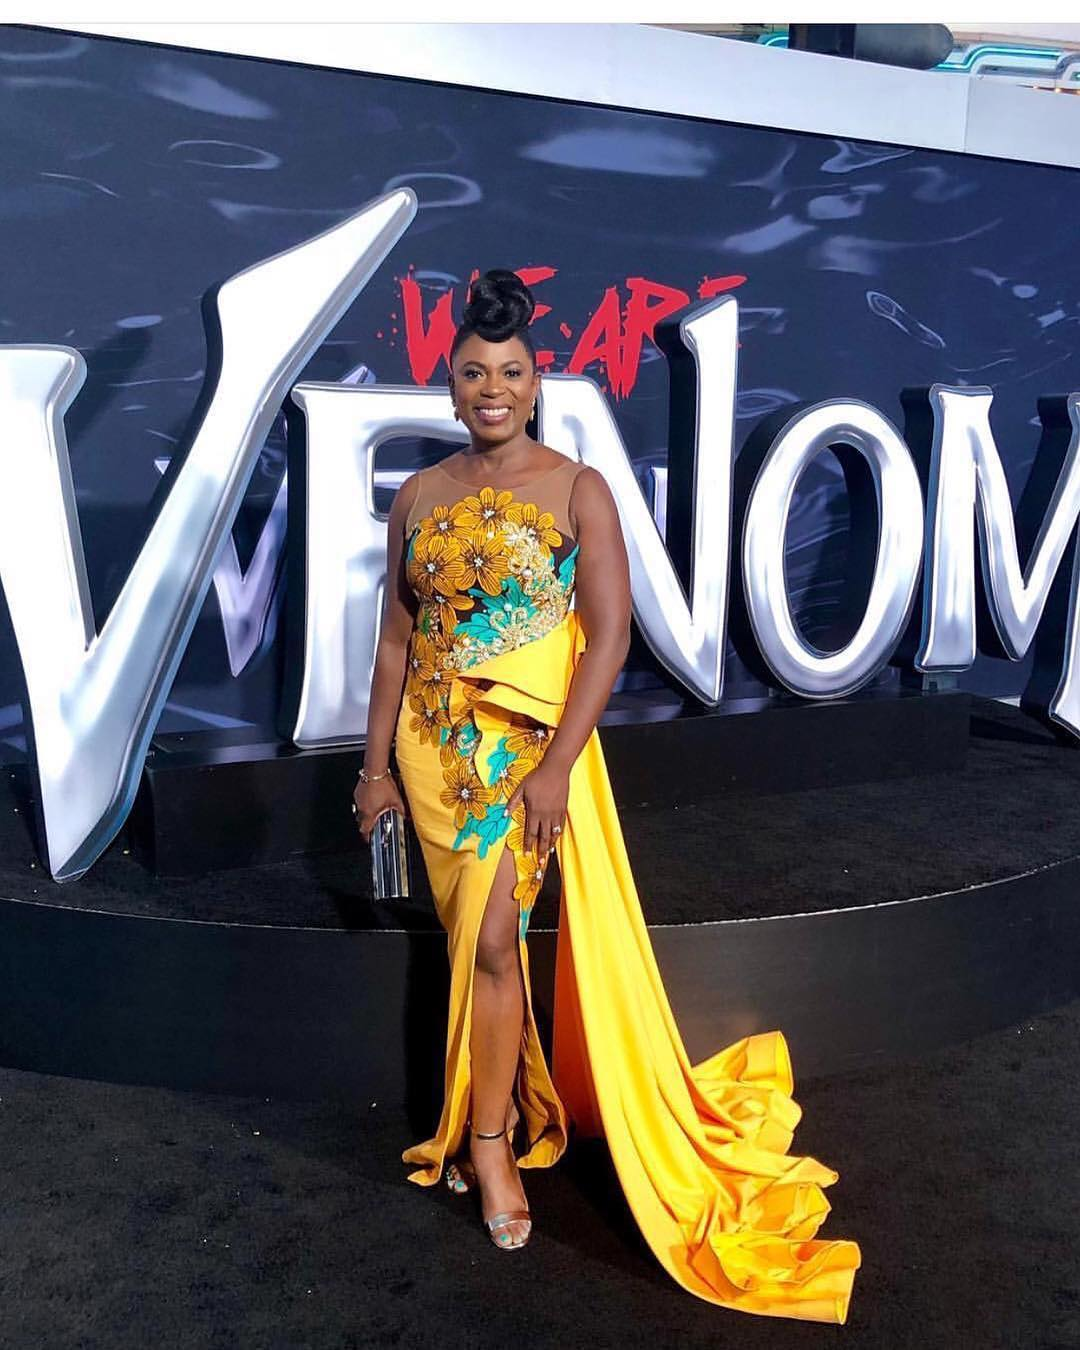 Sope Aluko Wore A Custom Kathy Anthony Dress For Venom Movie Premiere